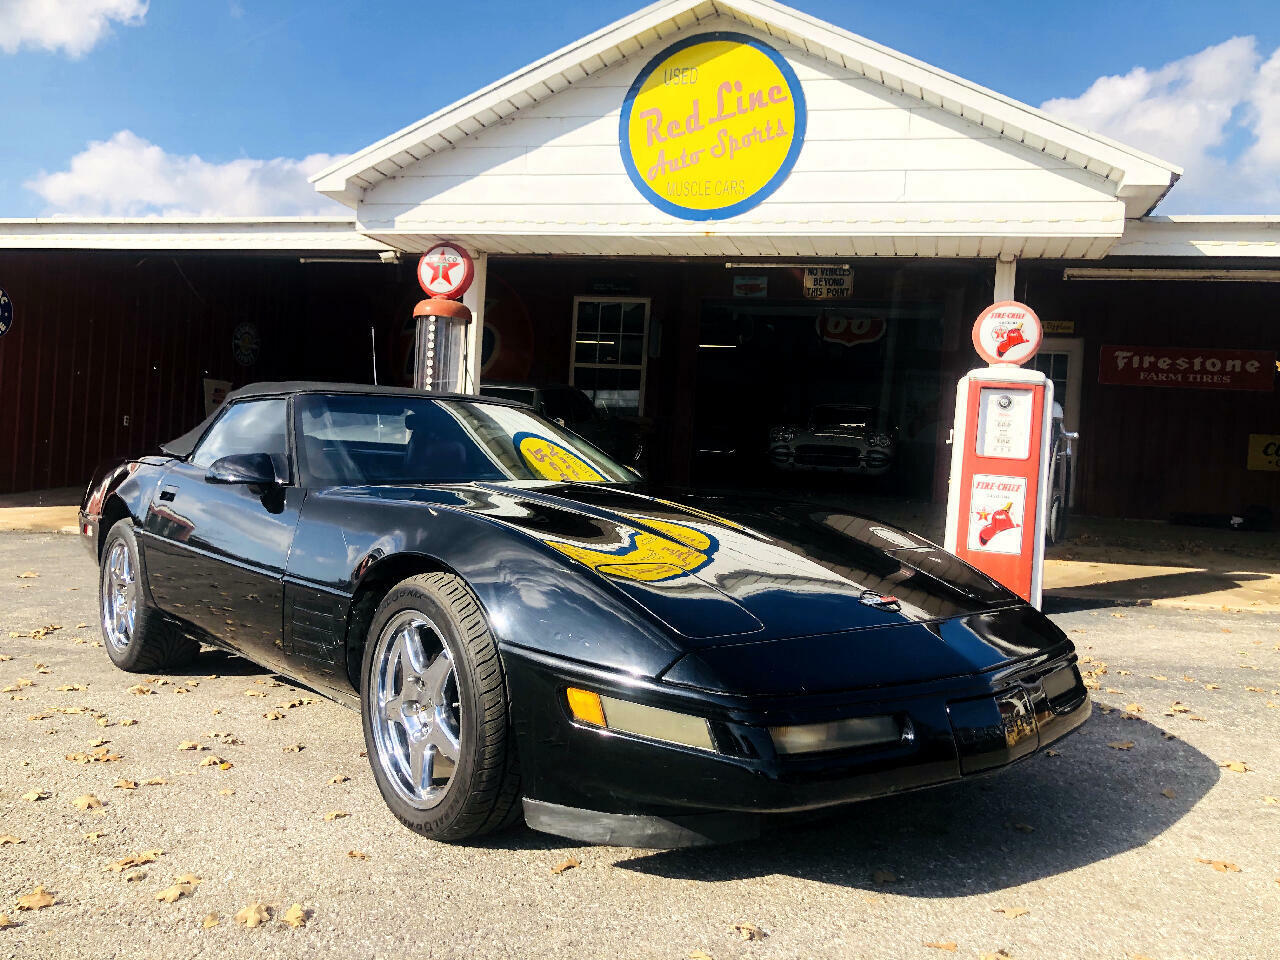 1991 Black Chevrolet Corvette Convertible  | C4 Corvette Photo 2